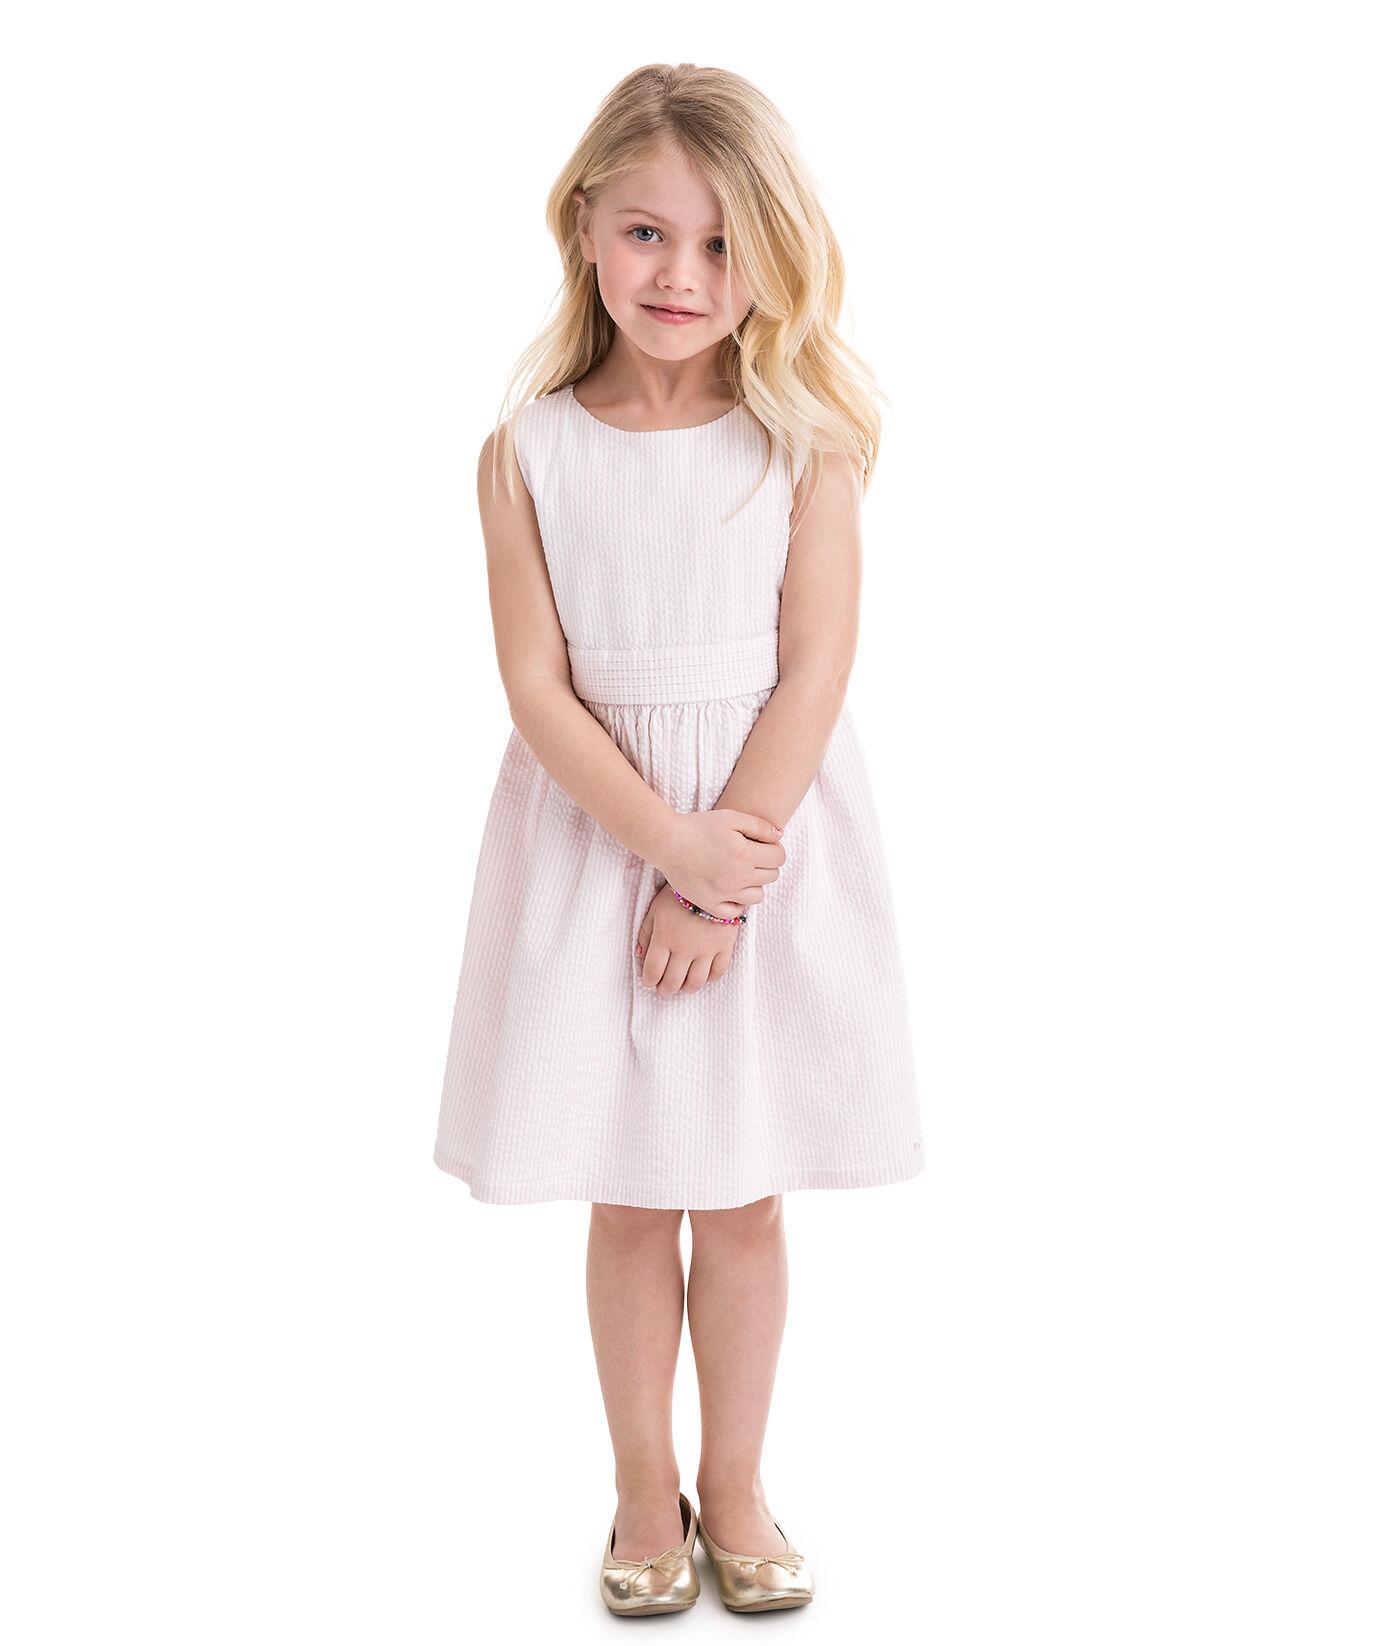 Girls Clothing Dress